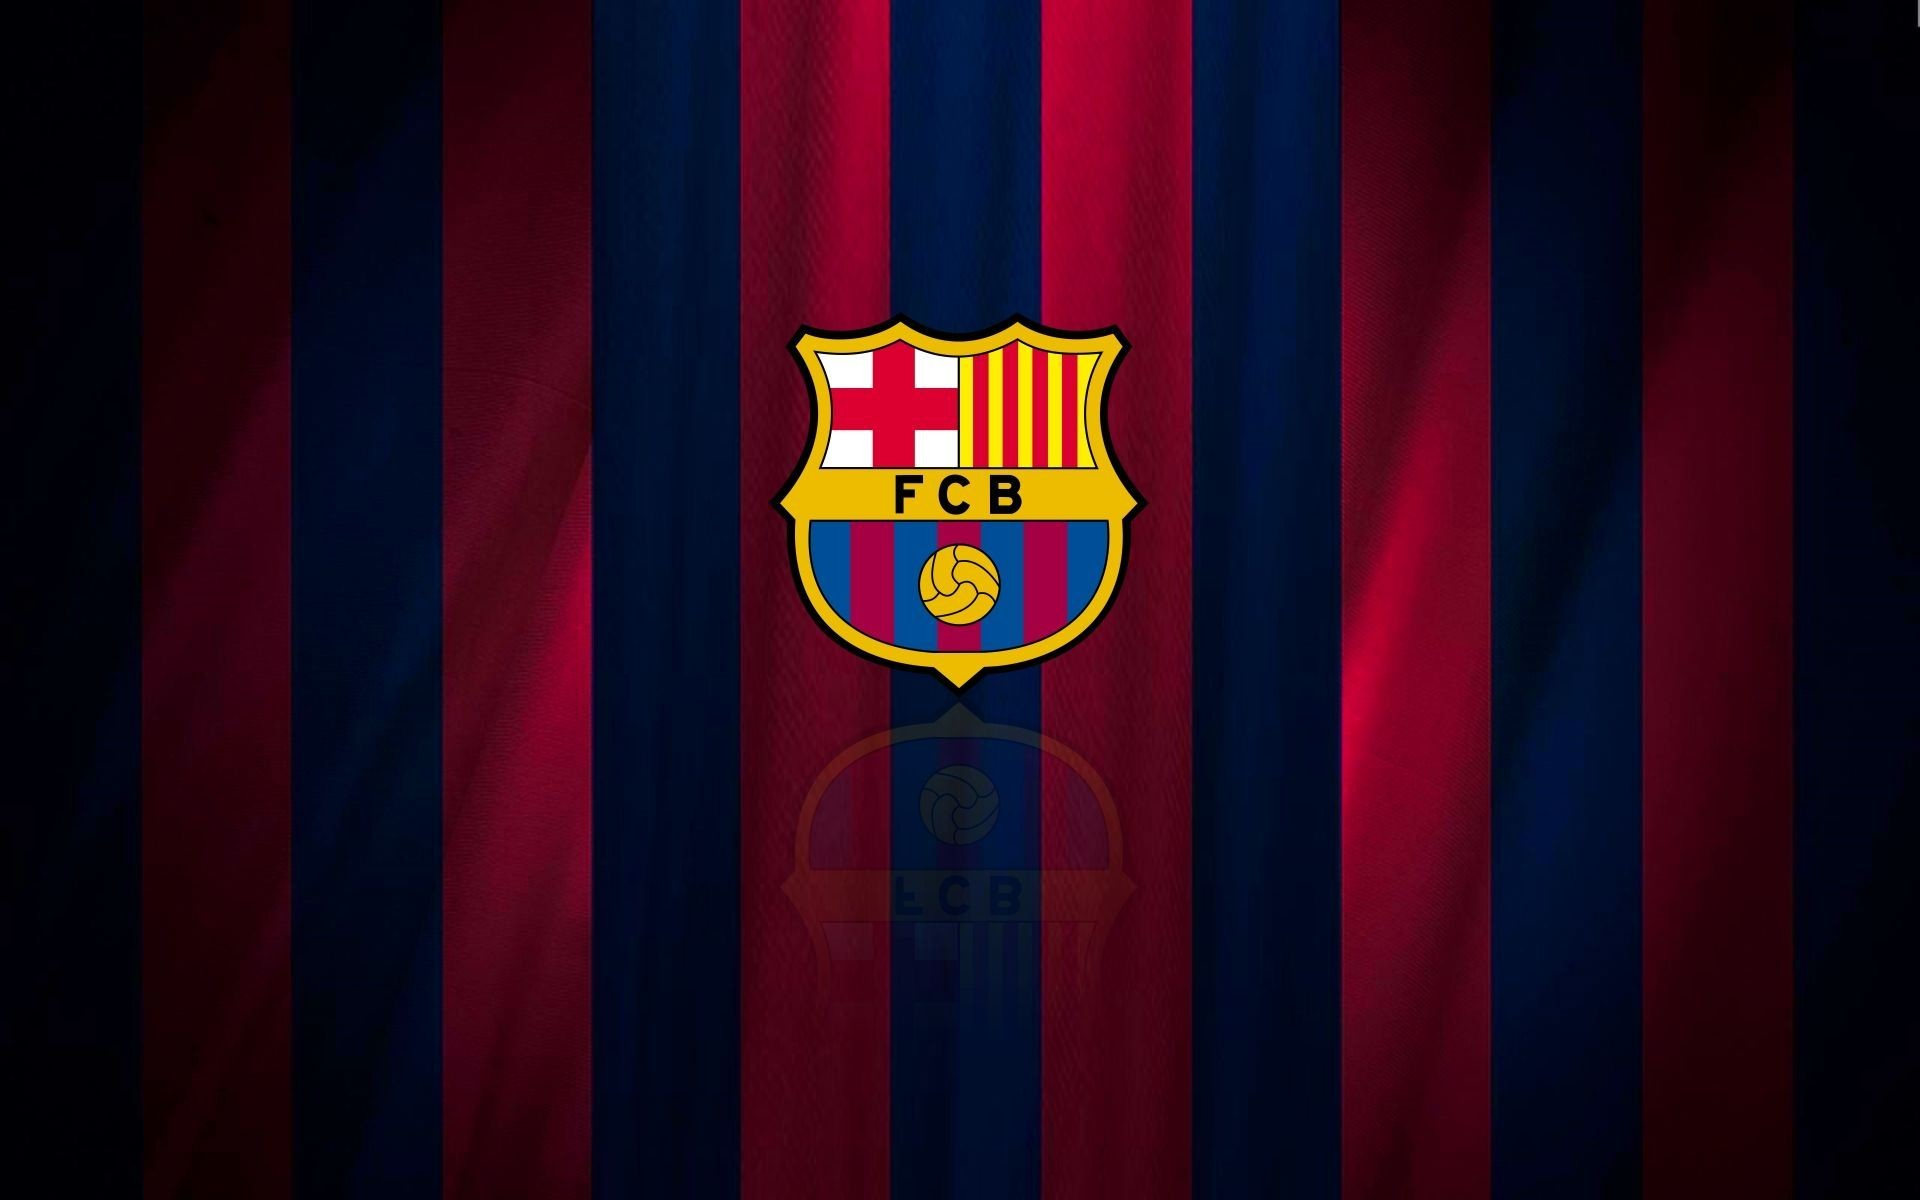 Sport Wallpaper Fc Barcelona: Fc Barcelona Wallpaper 2018 (67+ Images